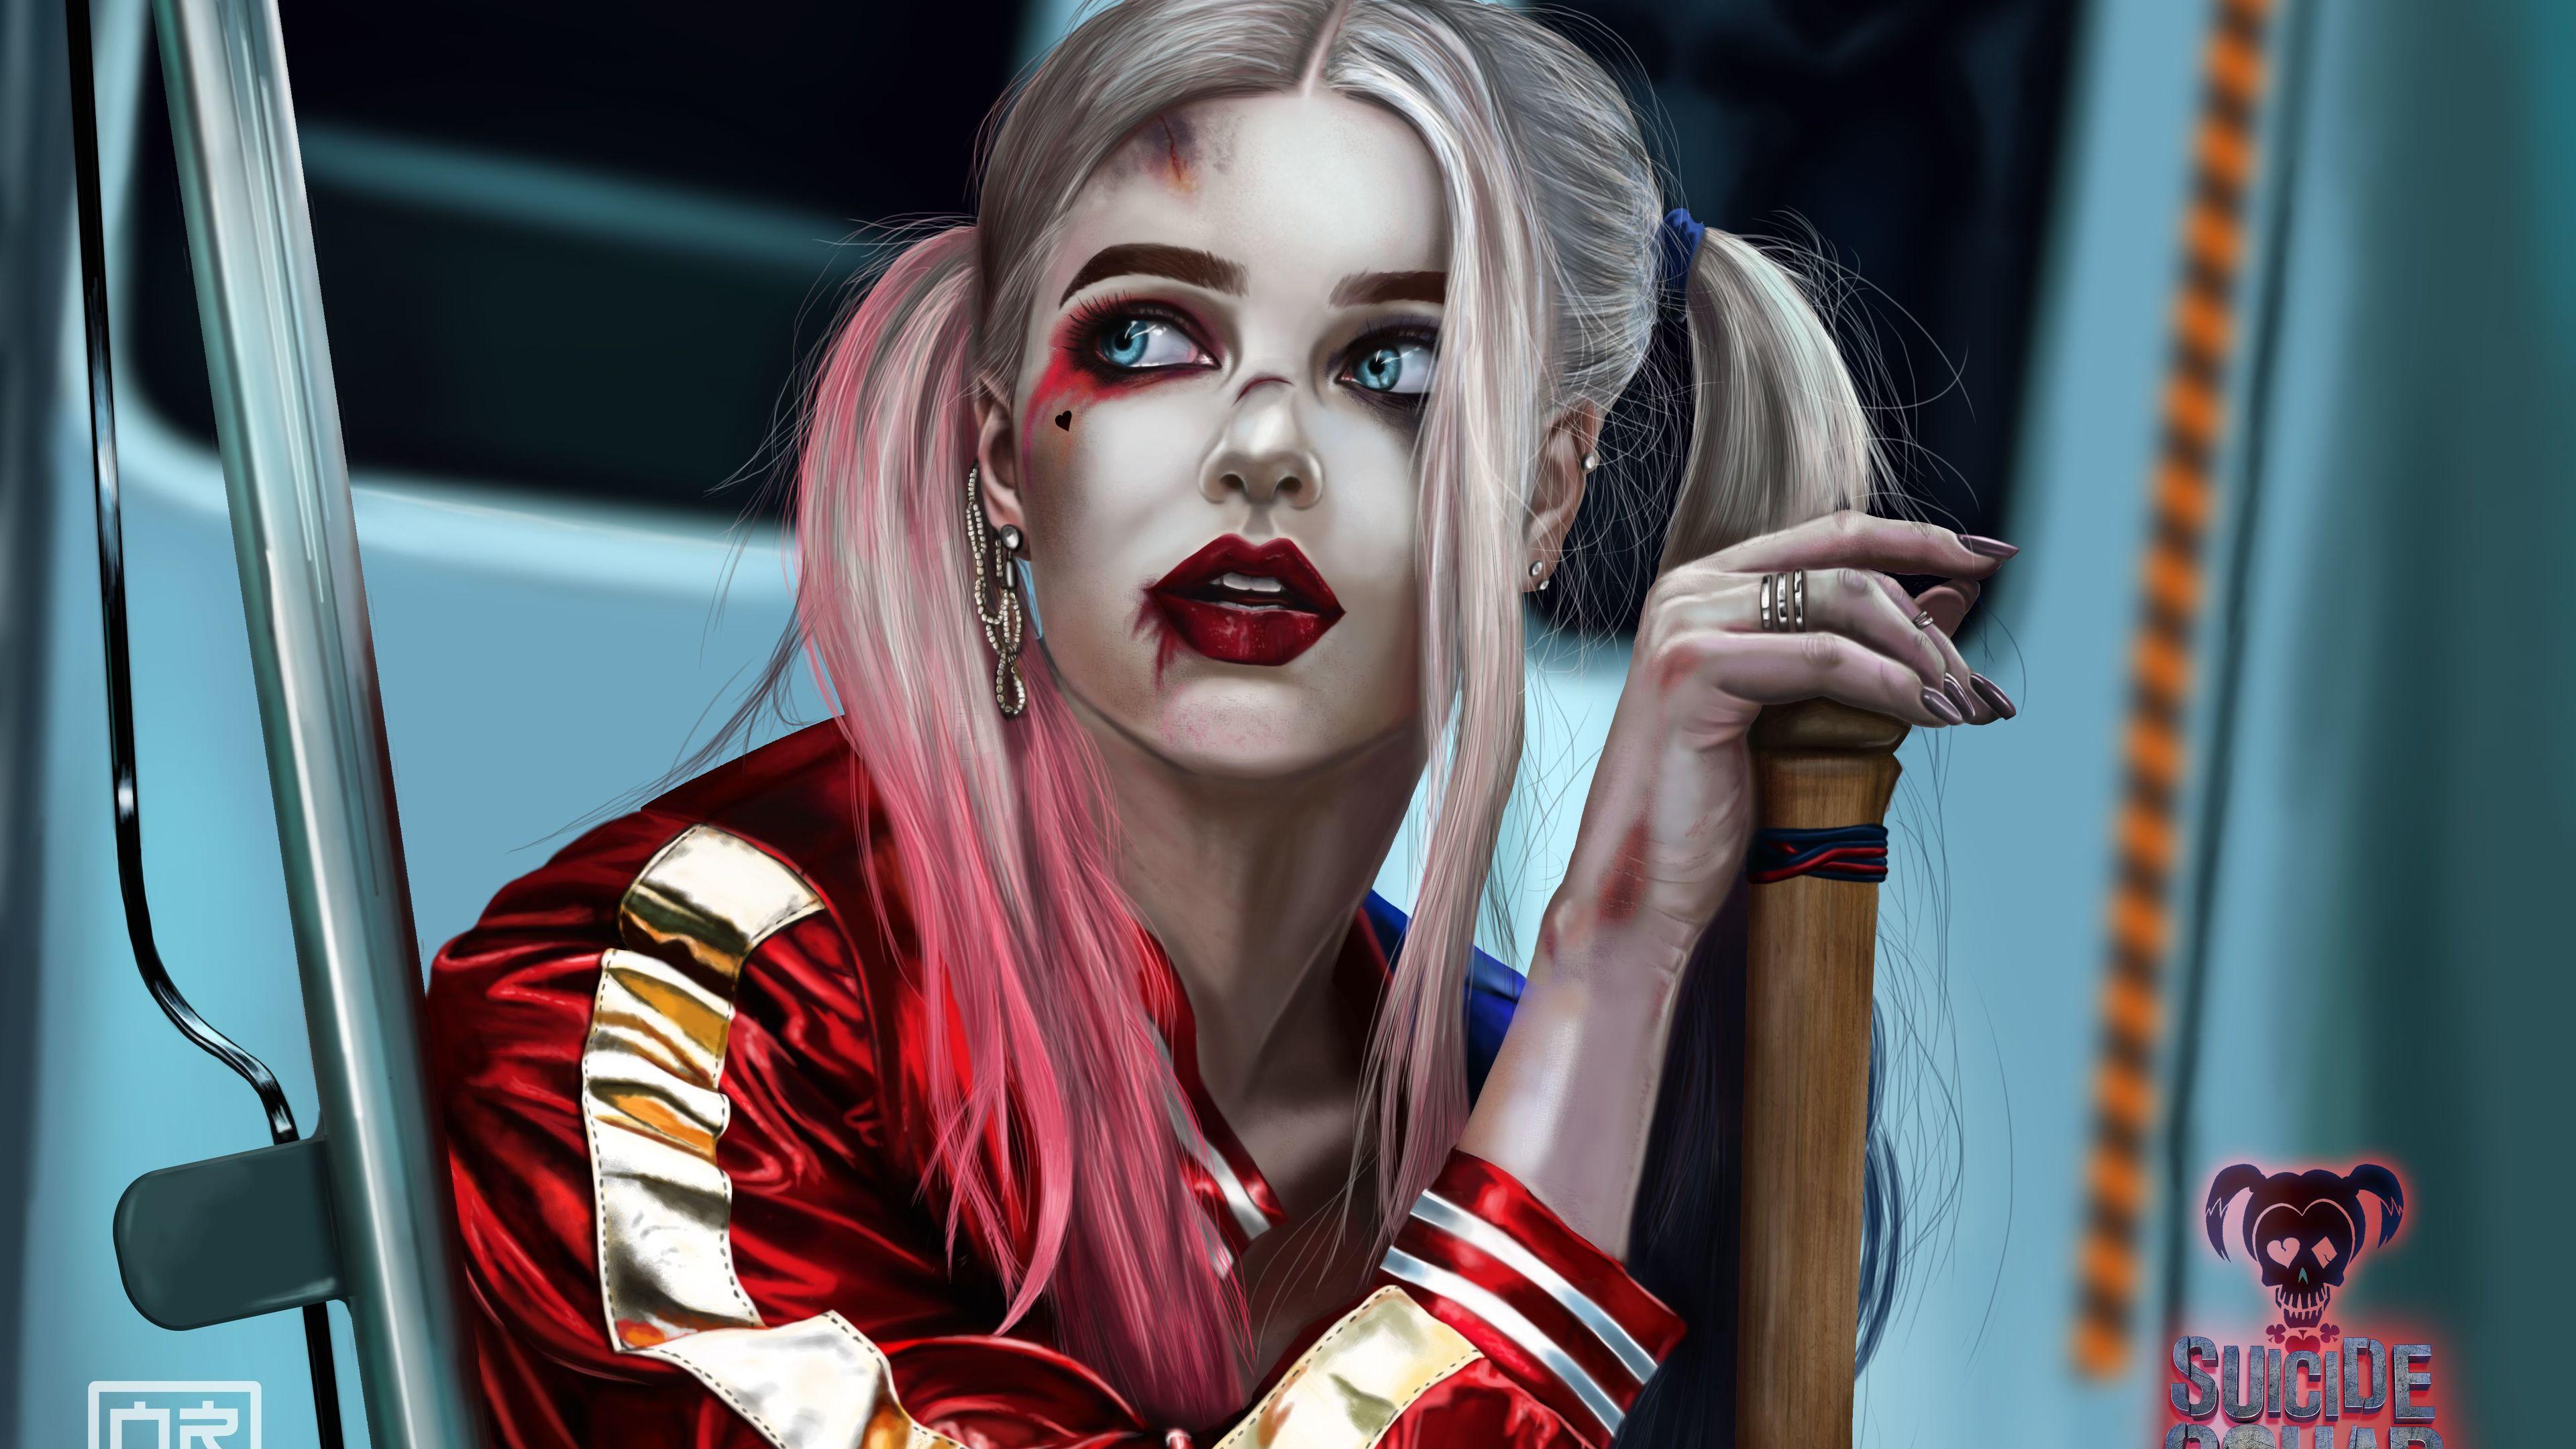 Unduh 6000+ Wallpaper Hd Harley Quinn HD Terbaik